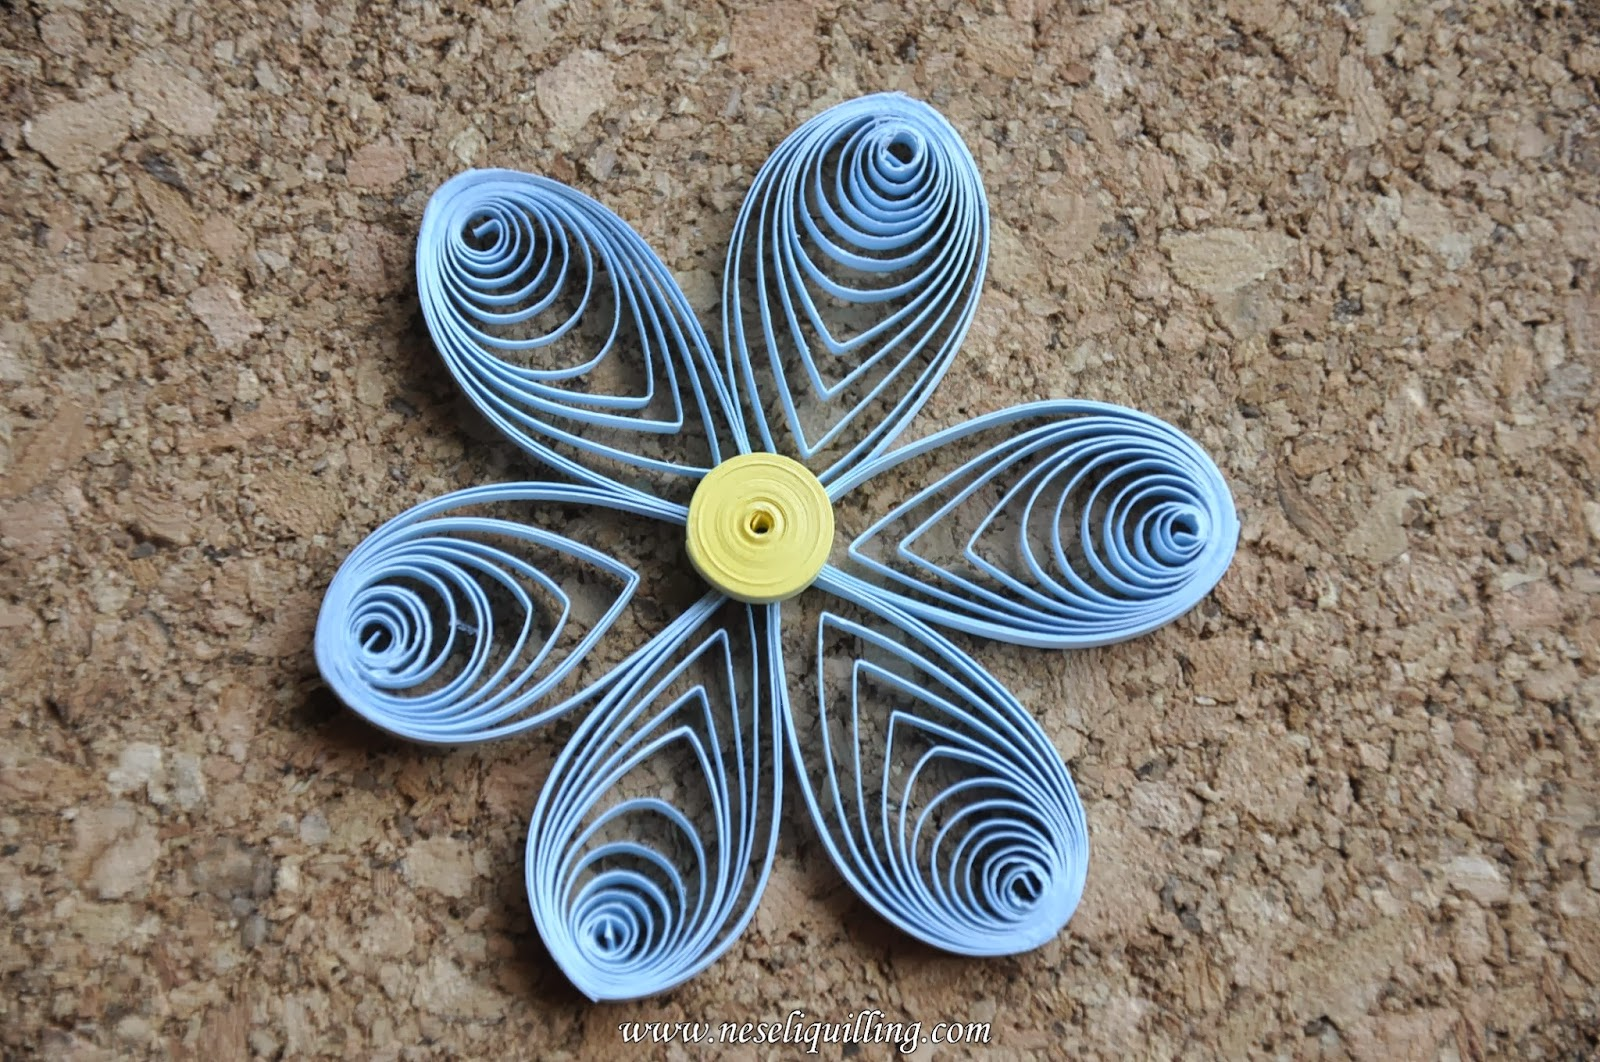 neşeli quilling istiridye çiçek - eccentric circles